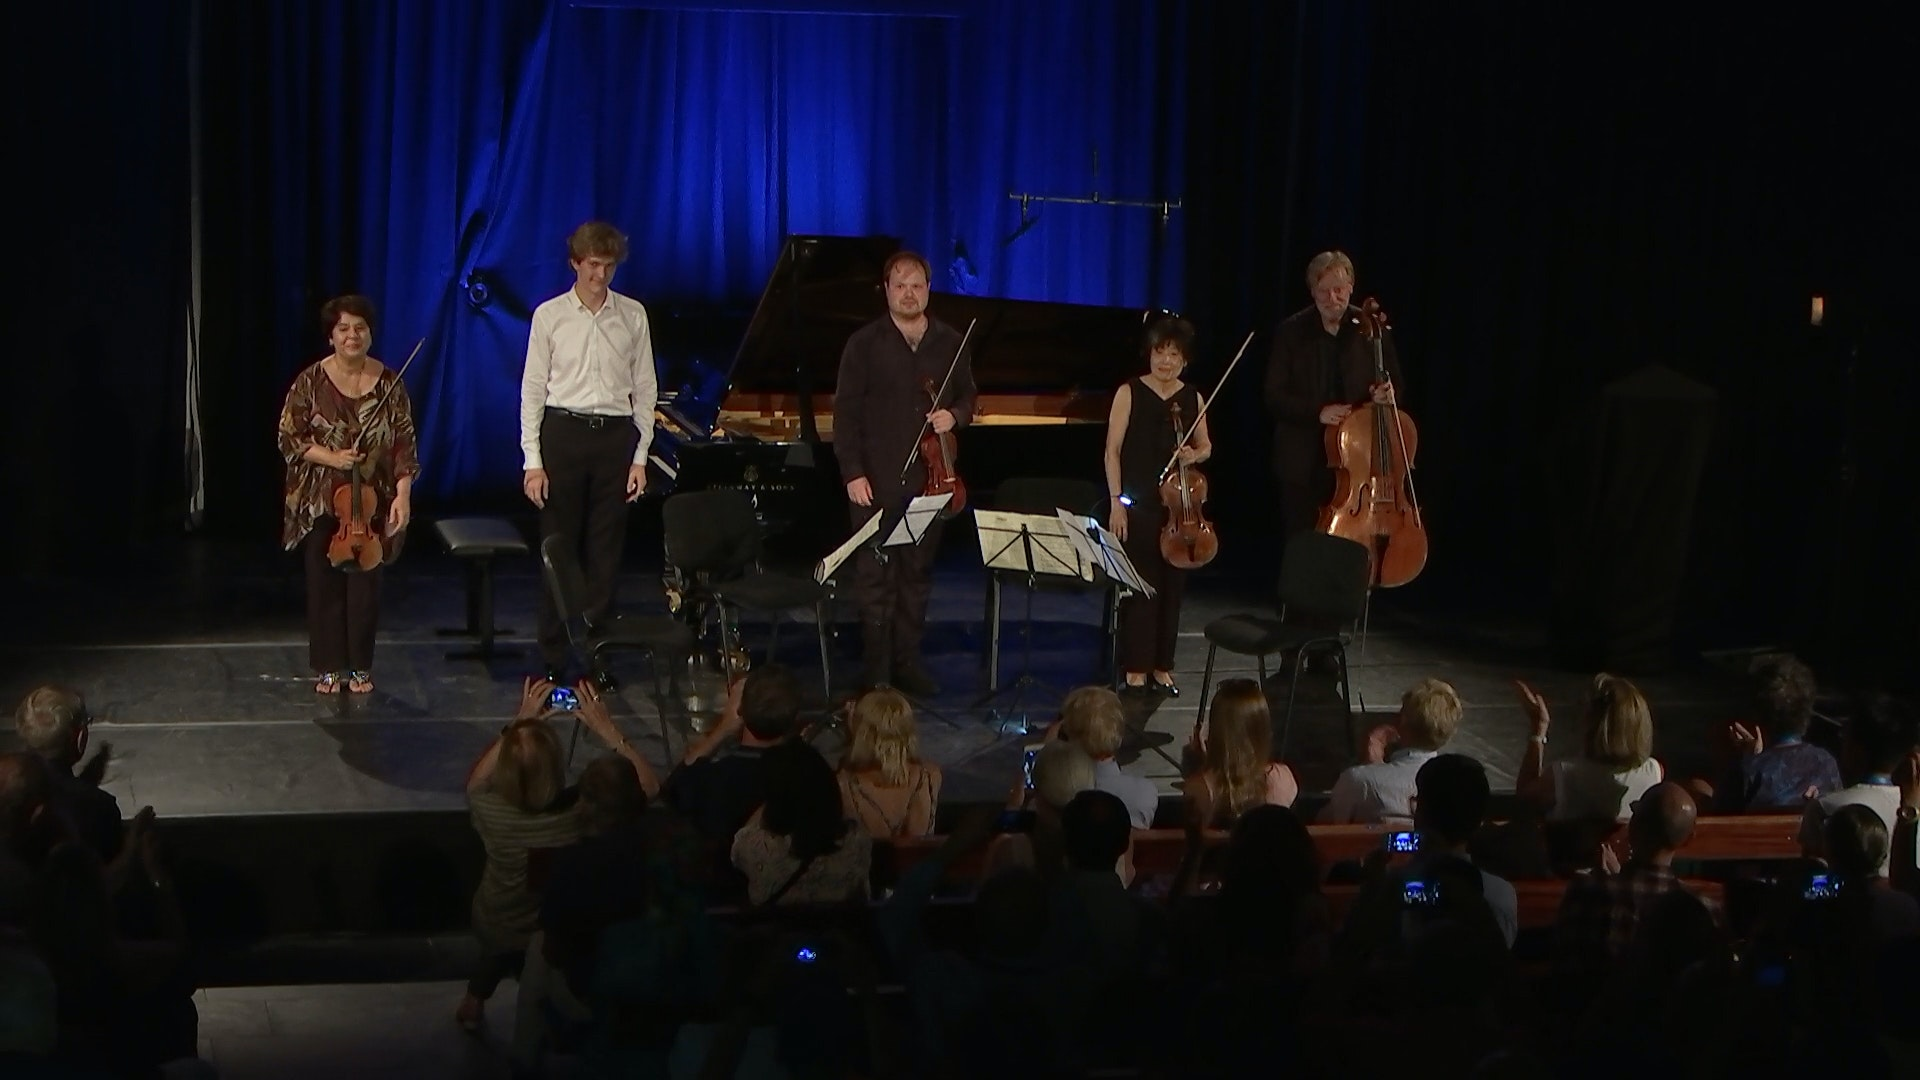 Le Michelangelo String Quartet et Jan Lisiecki jouent Schubert, Bartók et Schumann